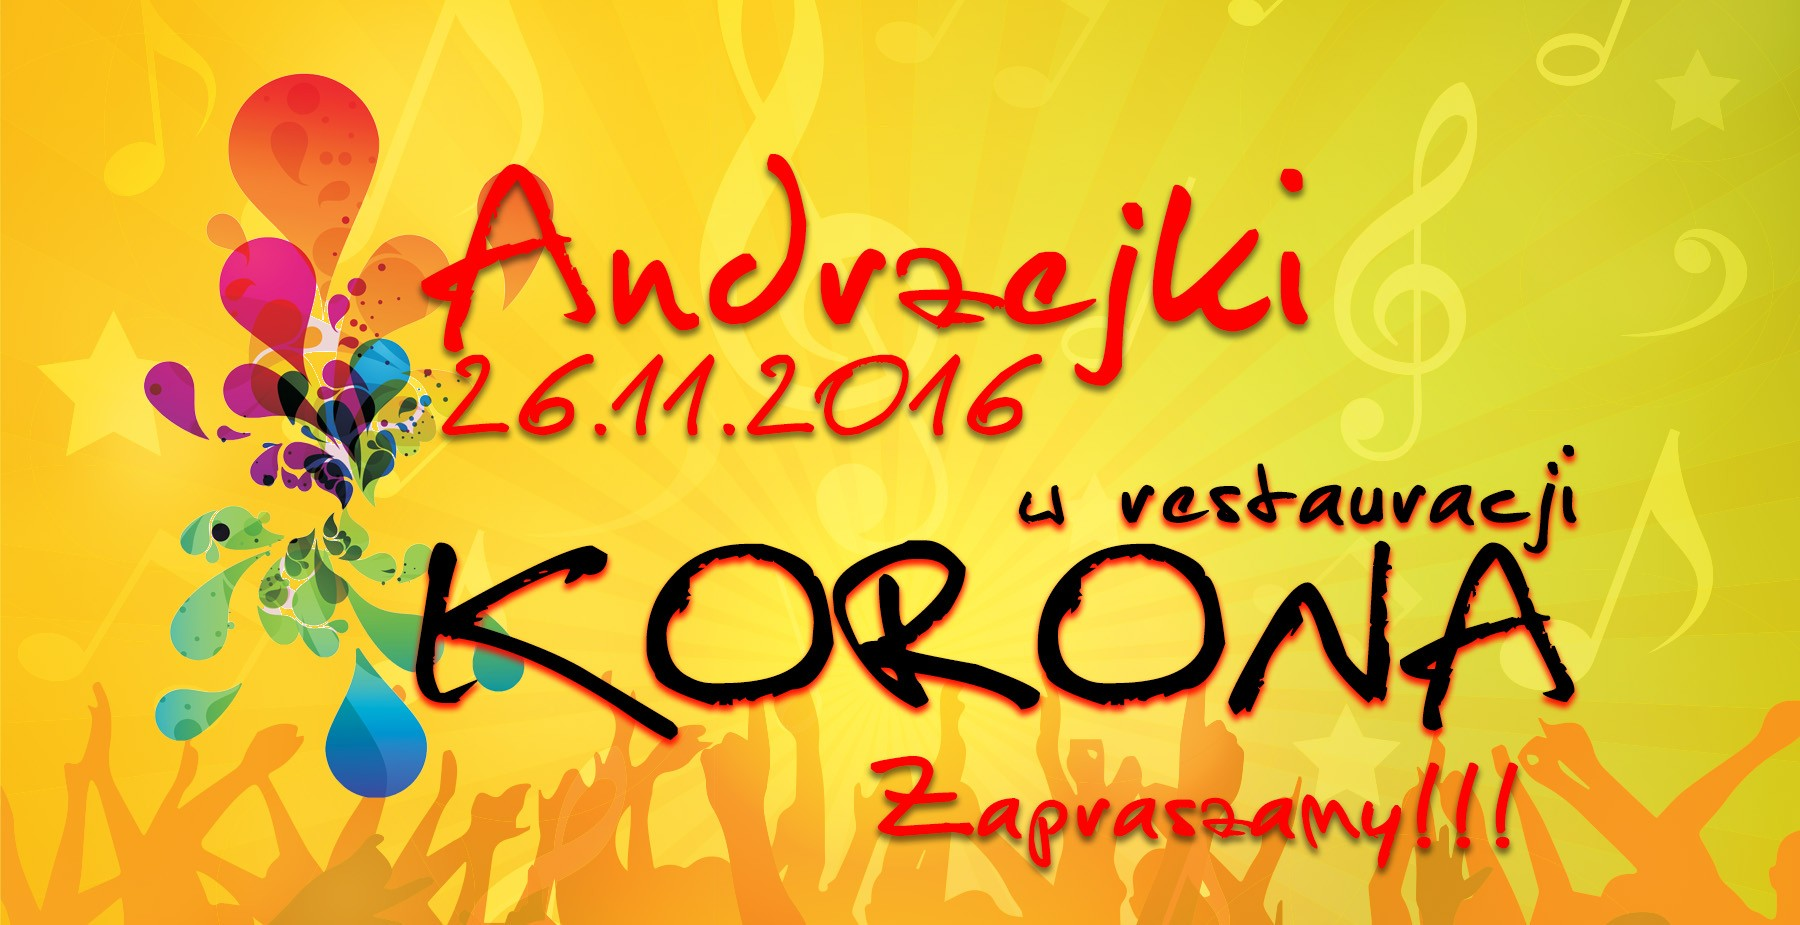 andrzejki_korona3